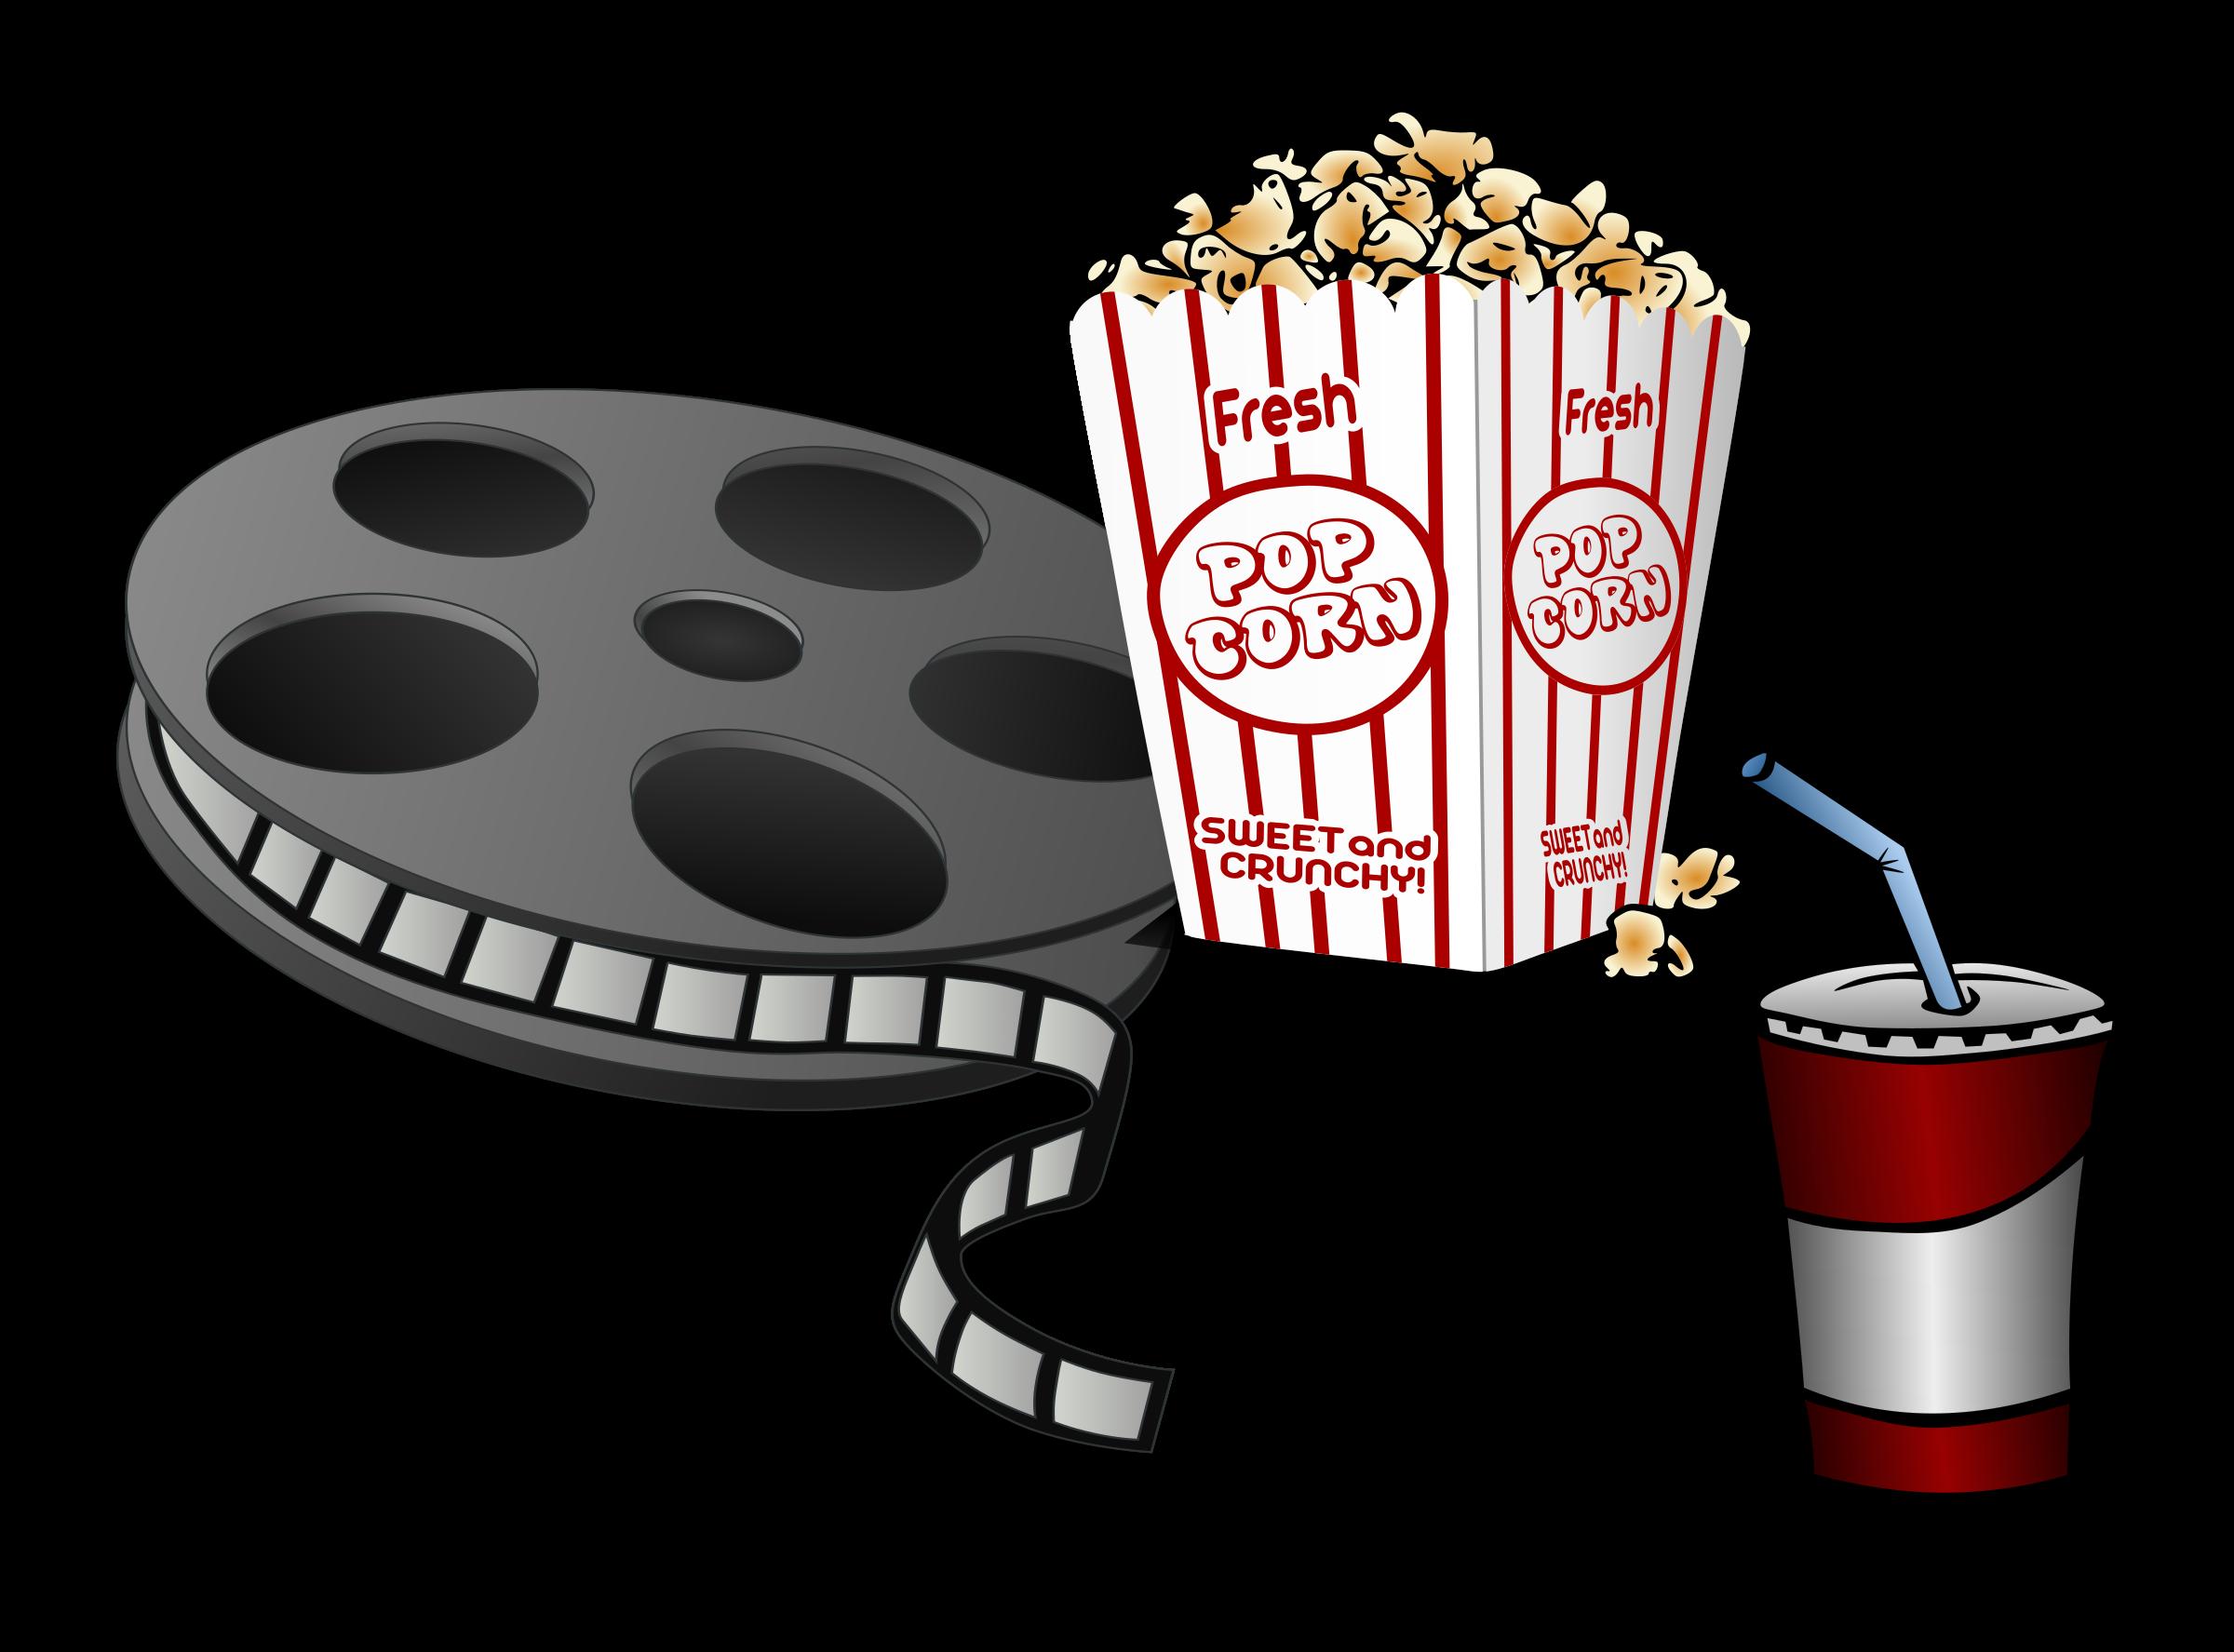 Cinema clipart movie time, Cinema movie time Transparent.